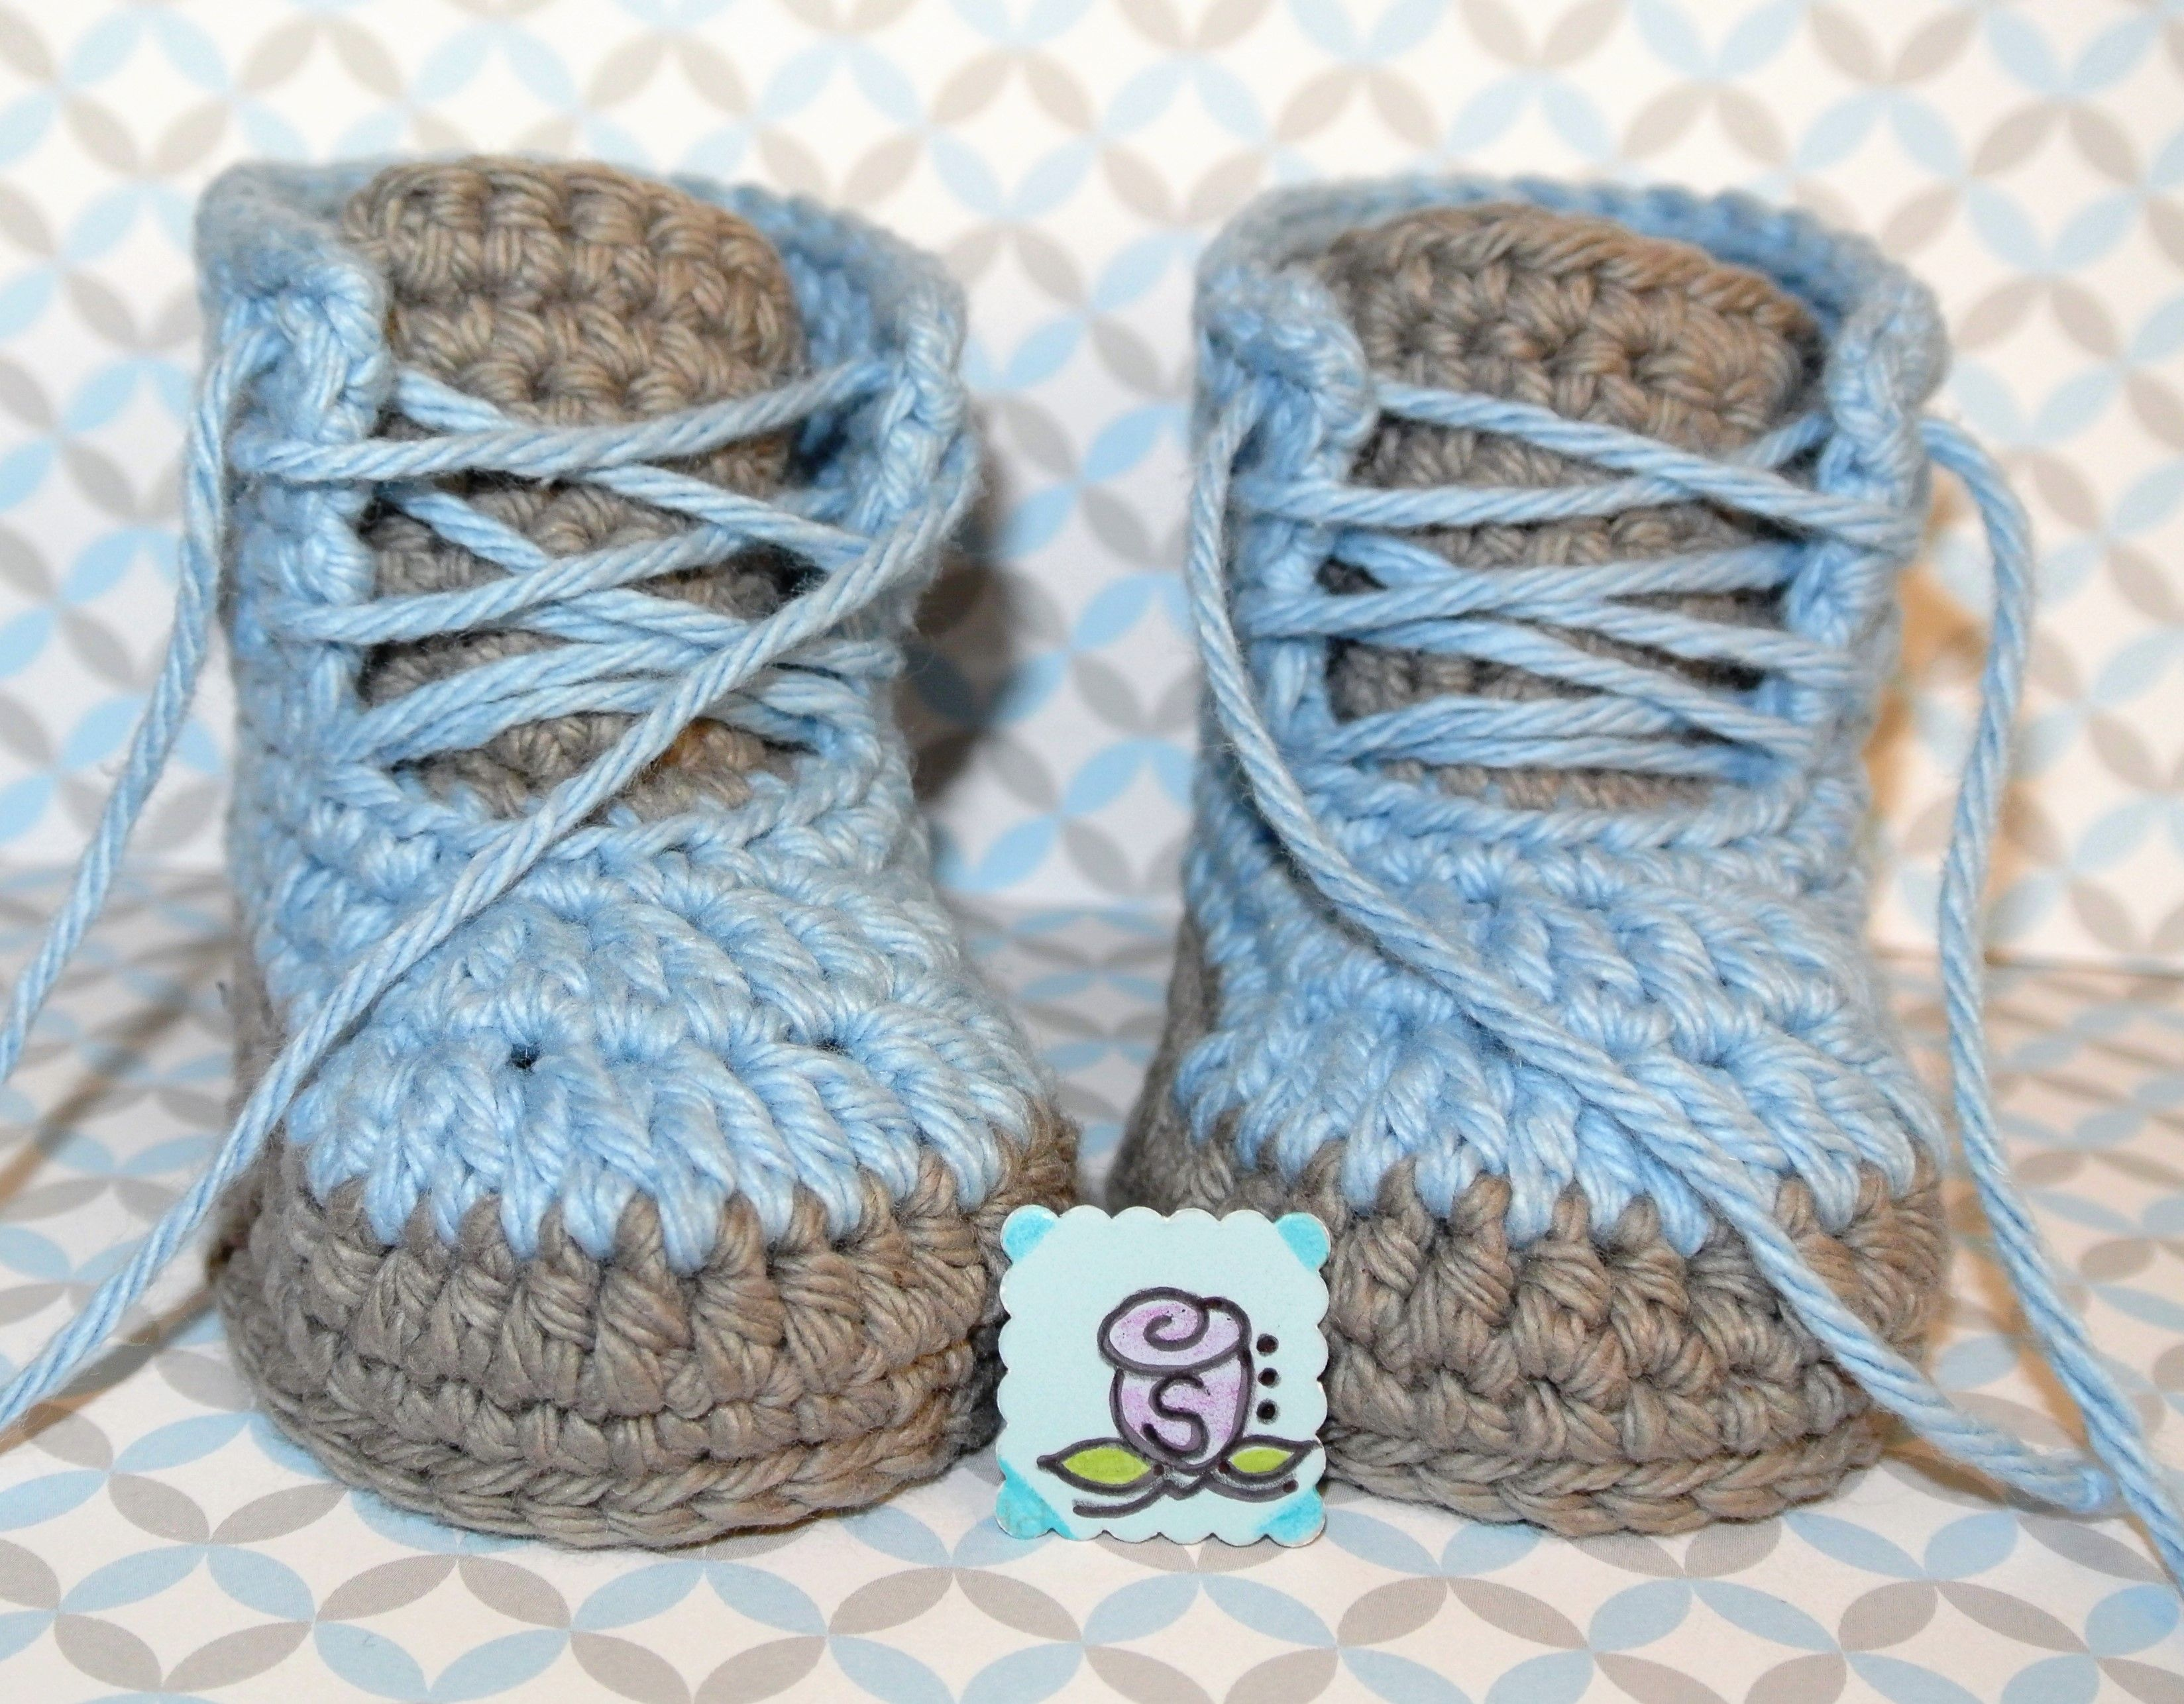 Crochet Baby Boy Shoes Made By Me Zapatito de Bebe a Crochet